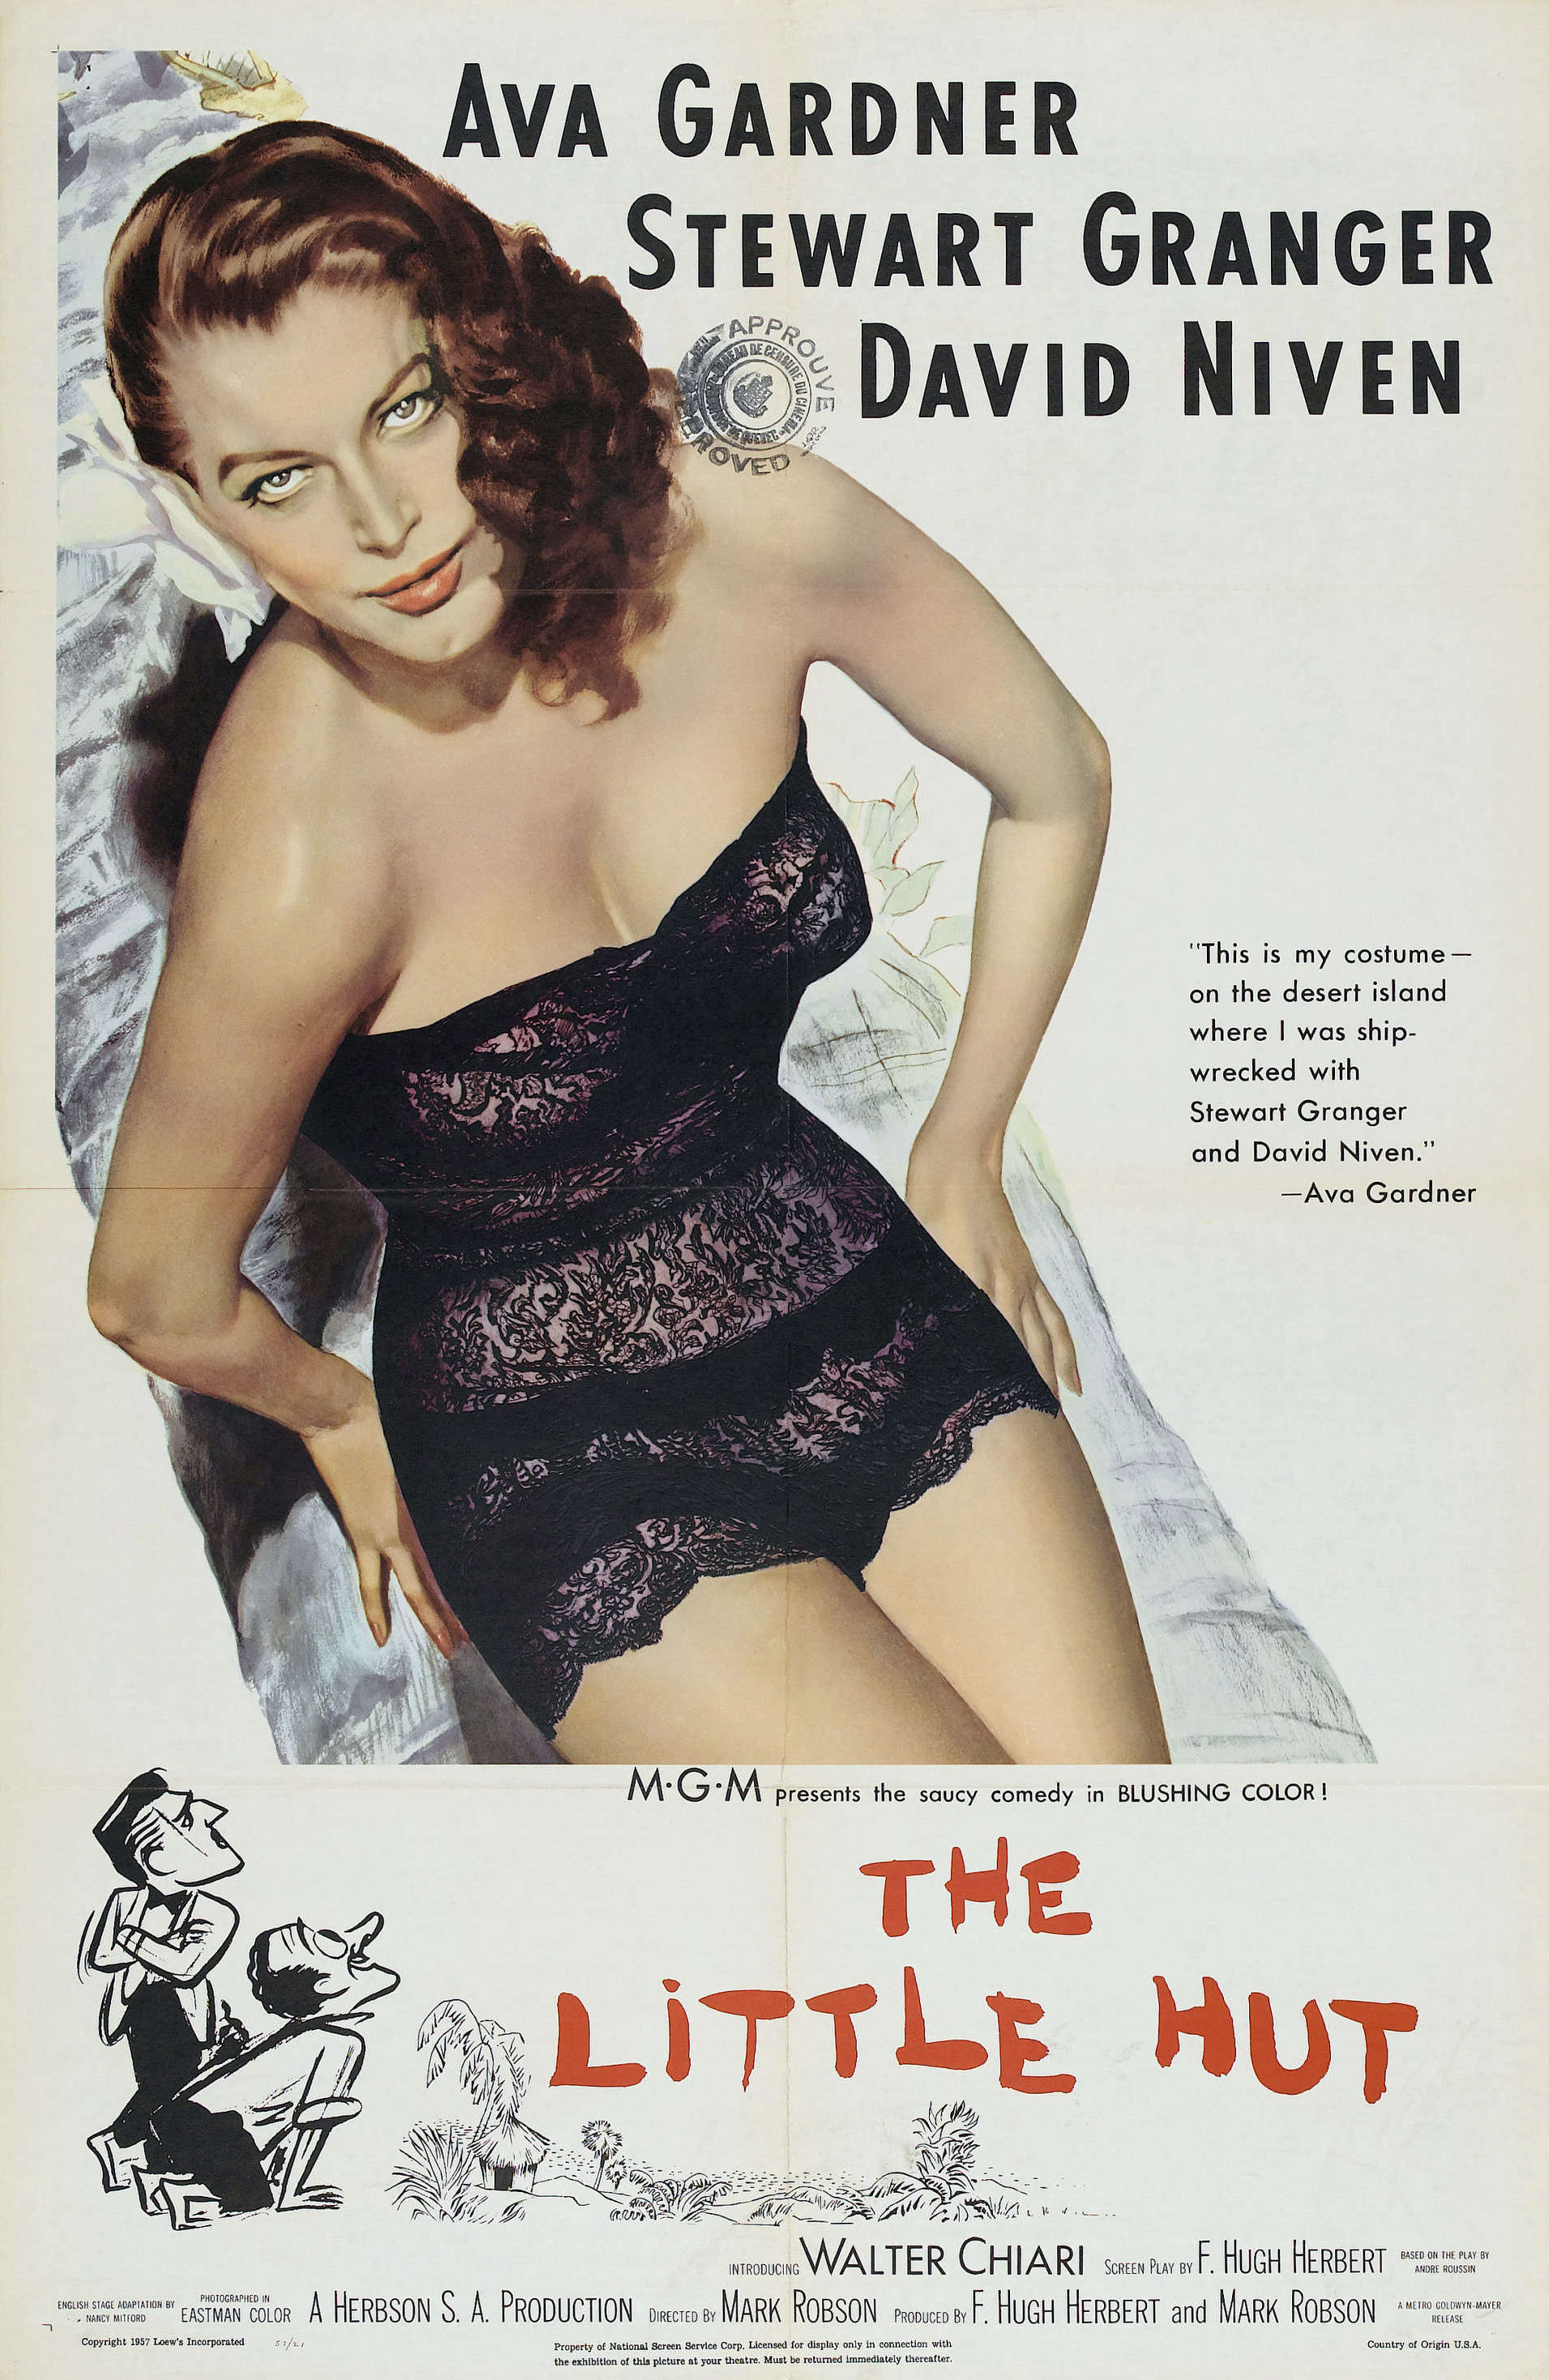 Simon MacCorkindale (1952?010),Daniela Droz Porno video Rosanna Roces (b. 1972),Jill Adams